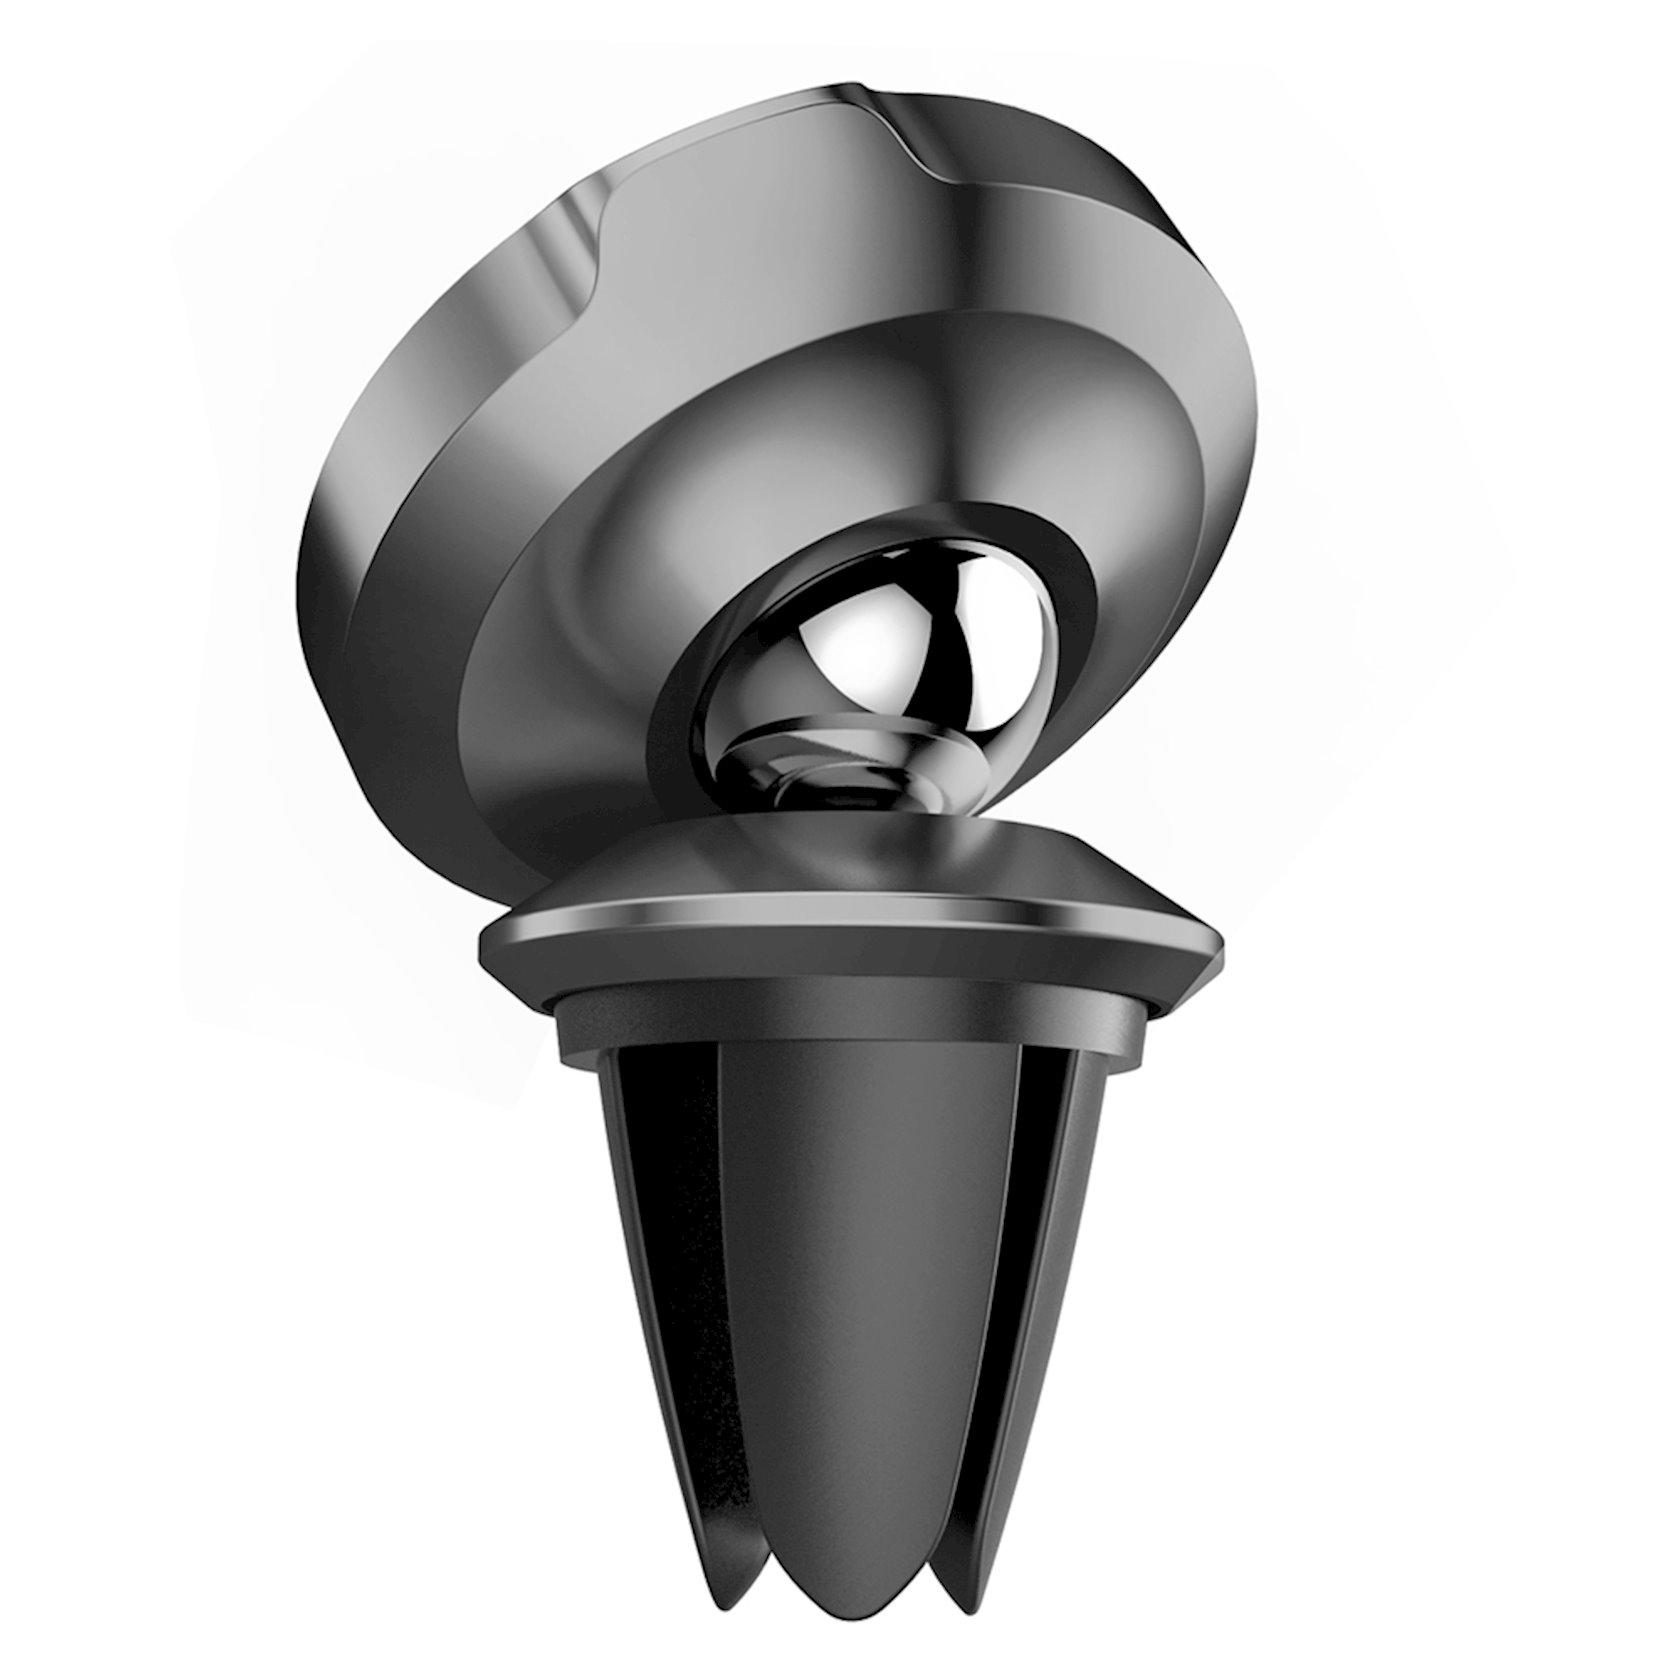 Avtomobil üçün maqnitli telefon tutucusu Baseus Small Ears Series Magnetic suction bracket (Air outlet type), qara, SUER-A01